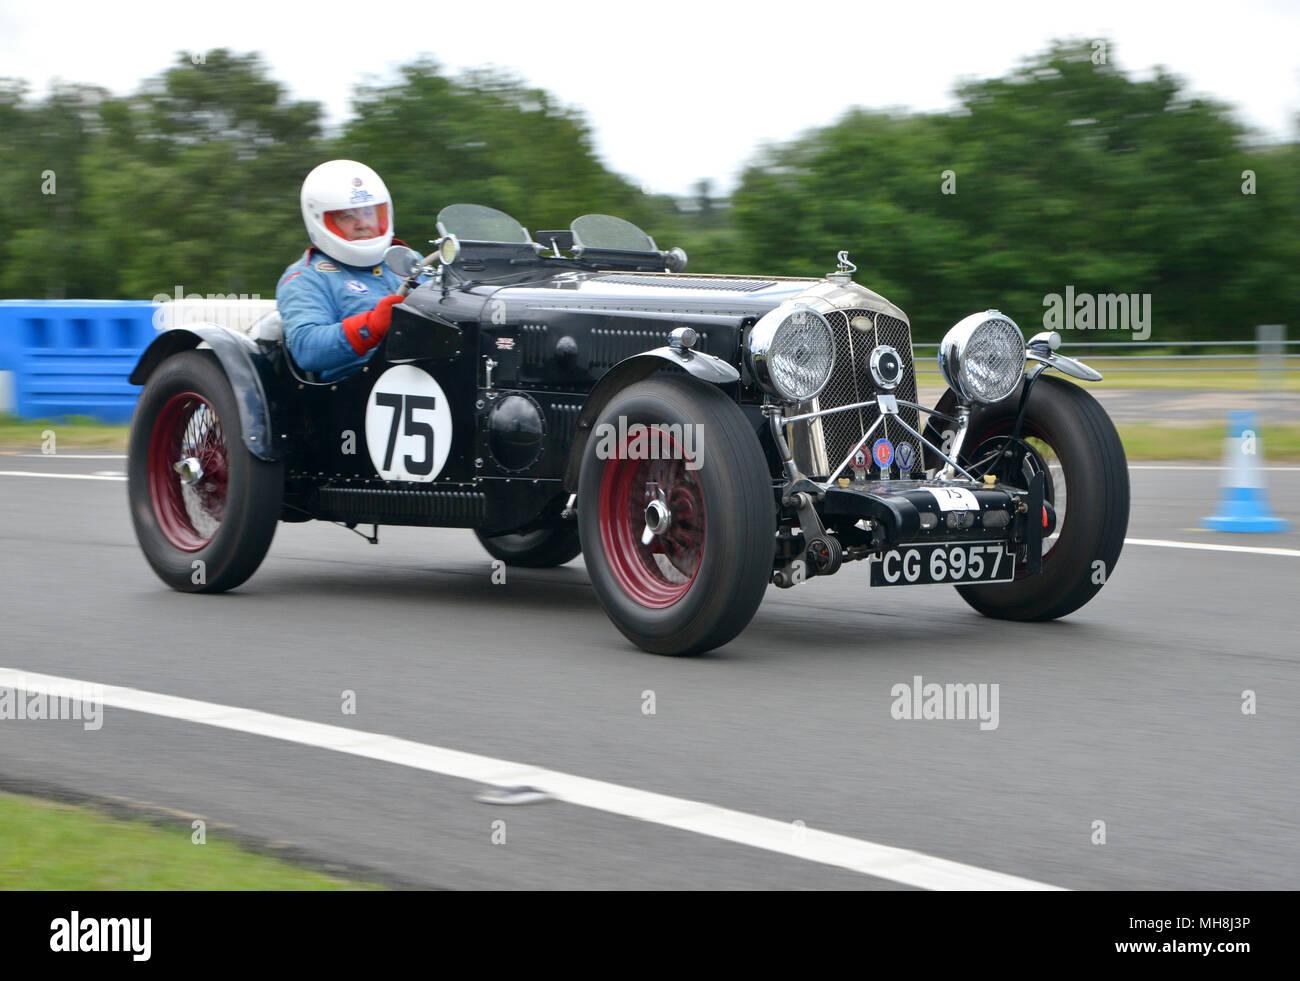 1934 Wolseley Hornet pre war sports car on track - Stock Image